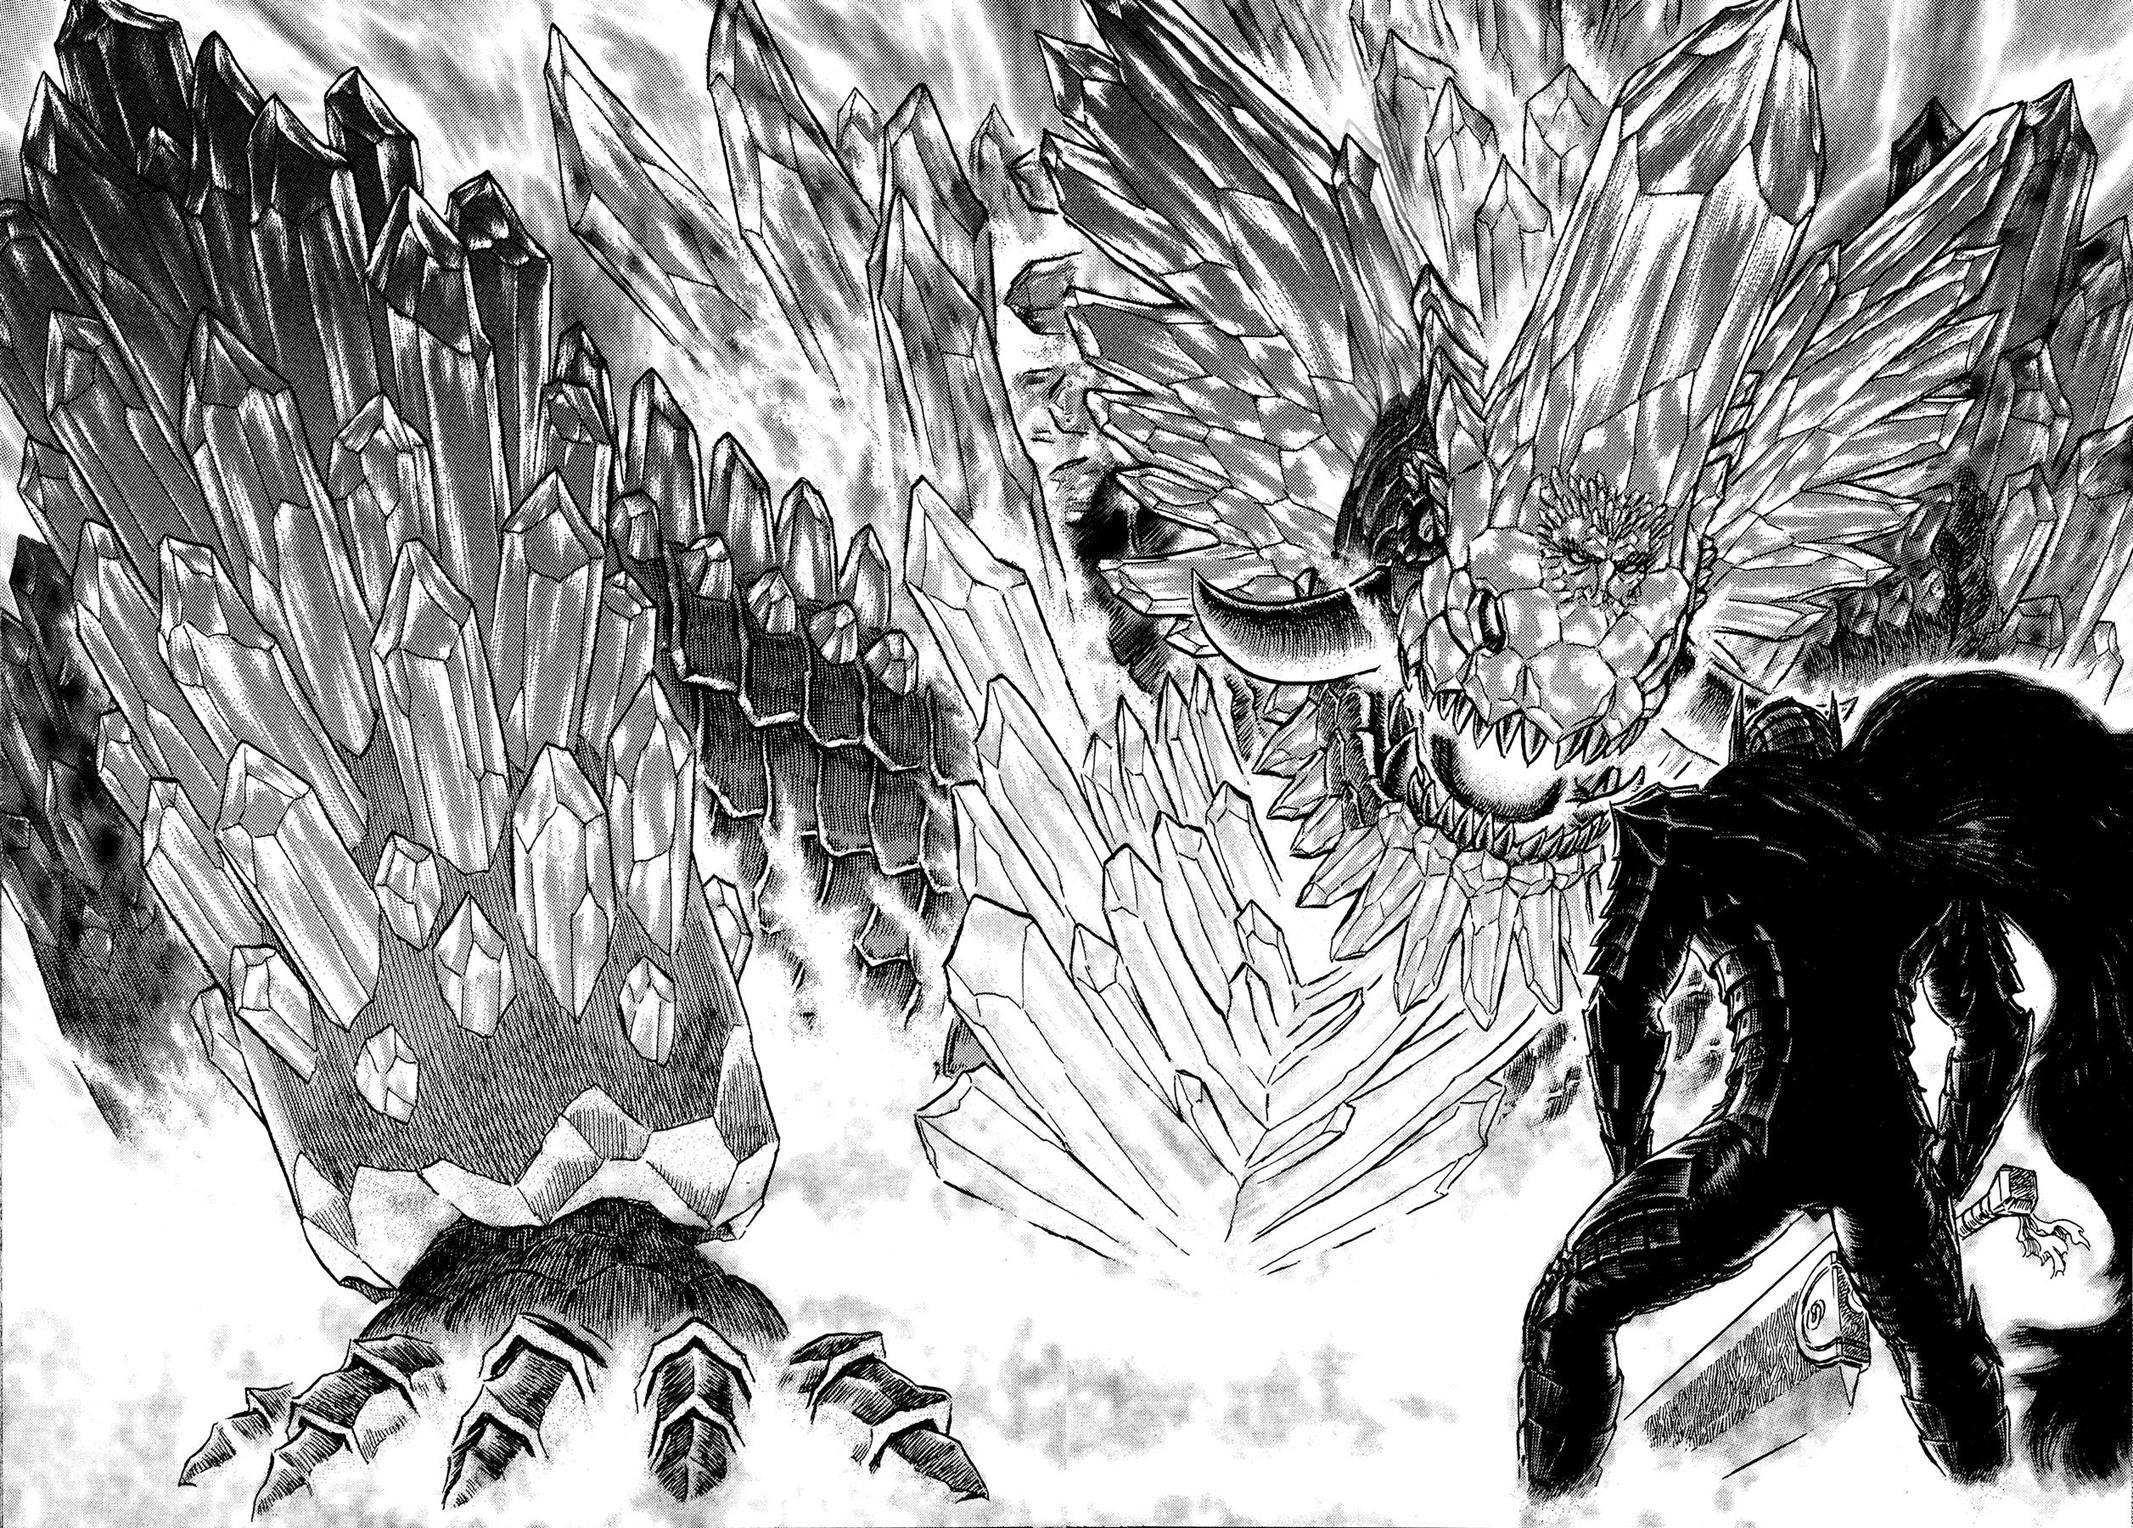 Read manga Berserk Chapter 227 online in high quality